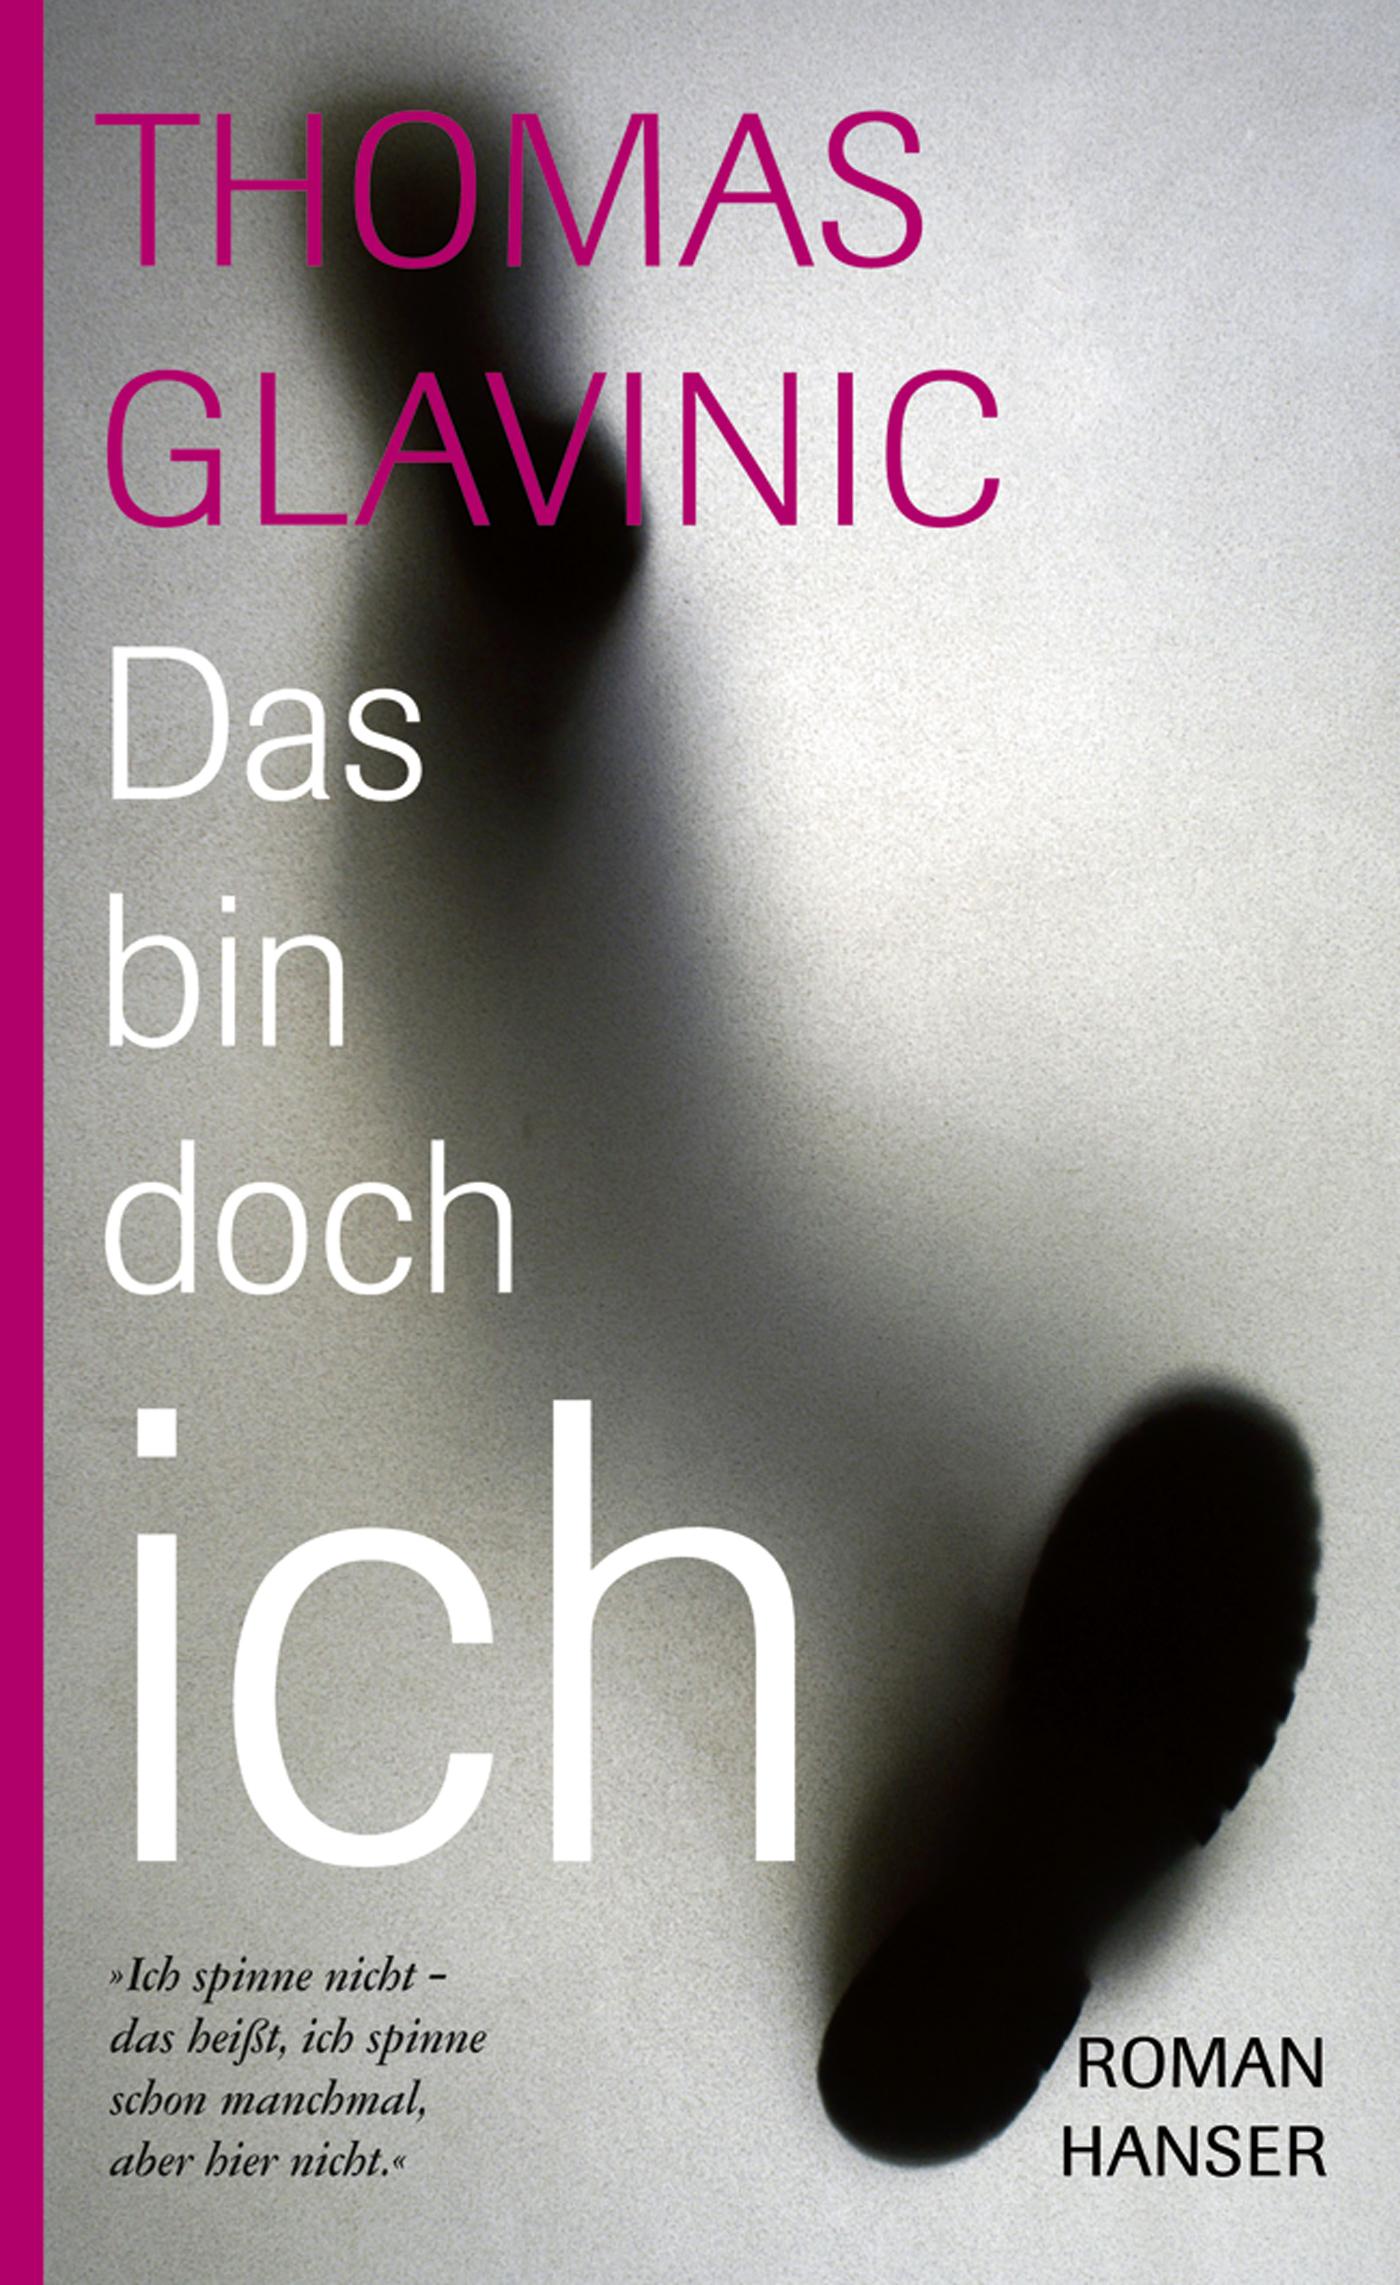 Das bin doch ich - Thomas Glavinic